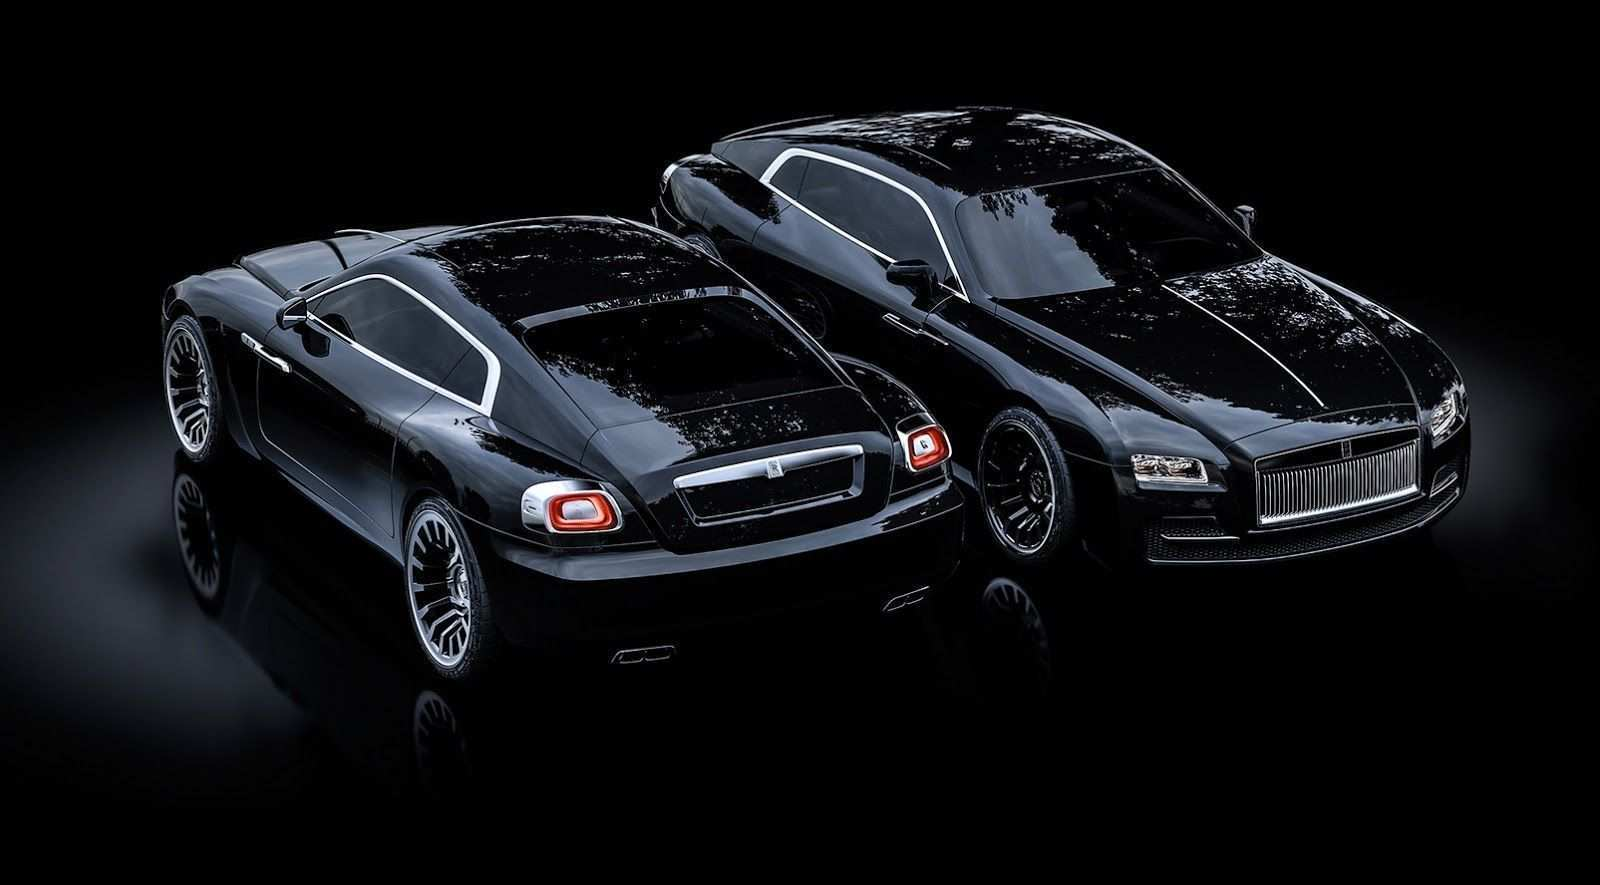 11 Concept of 2020 Rolls Royce Phantoms Rumors for 2020 Rolls Royce Phantoms